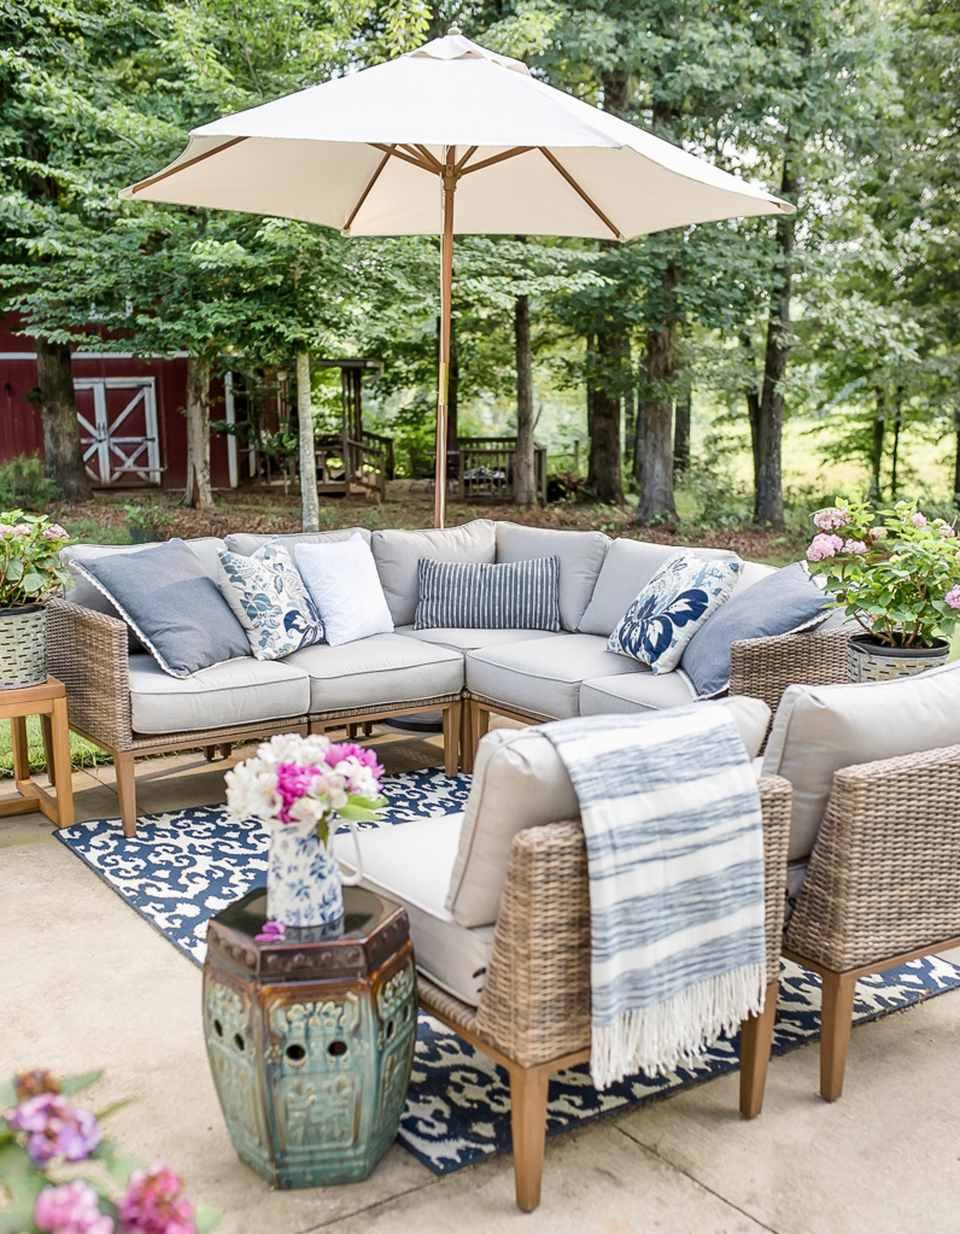 10 Creative and Inexpensive DIY Patios on Diy Backyard Patio Cheap  id=45309